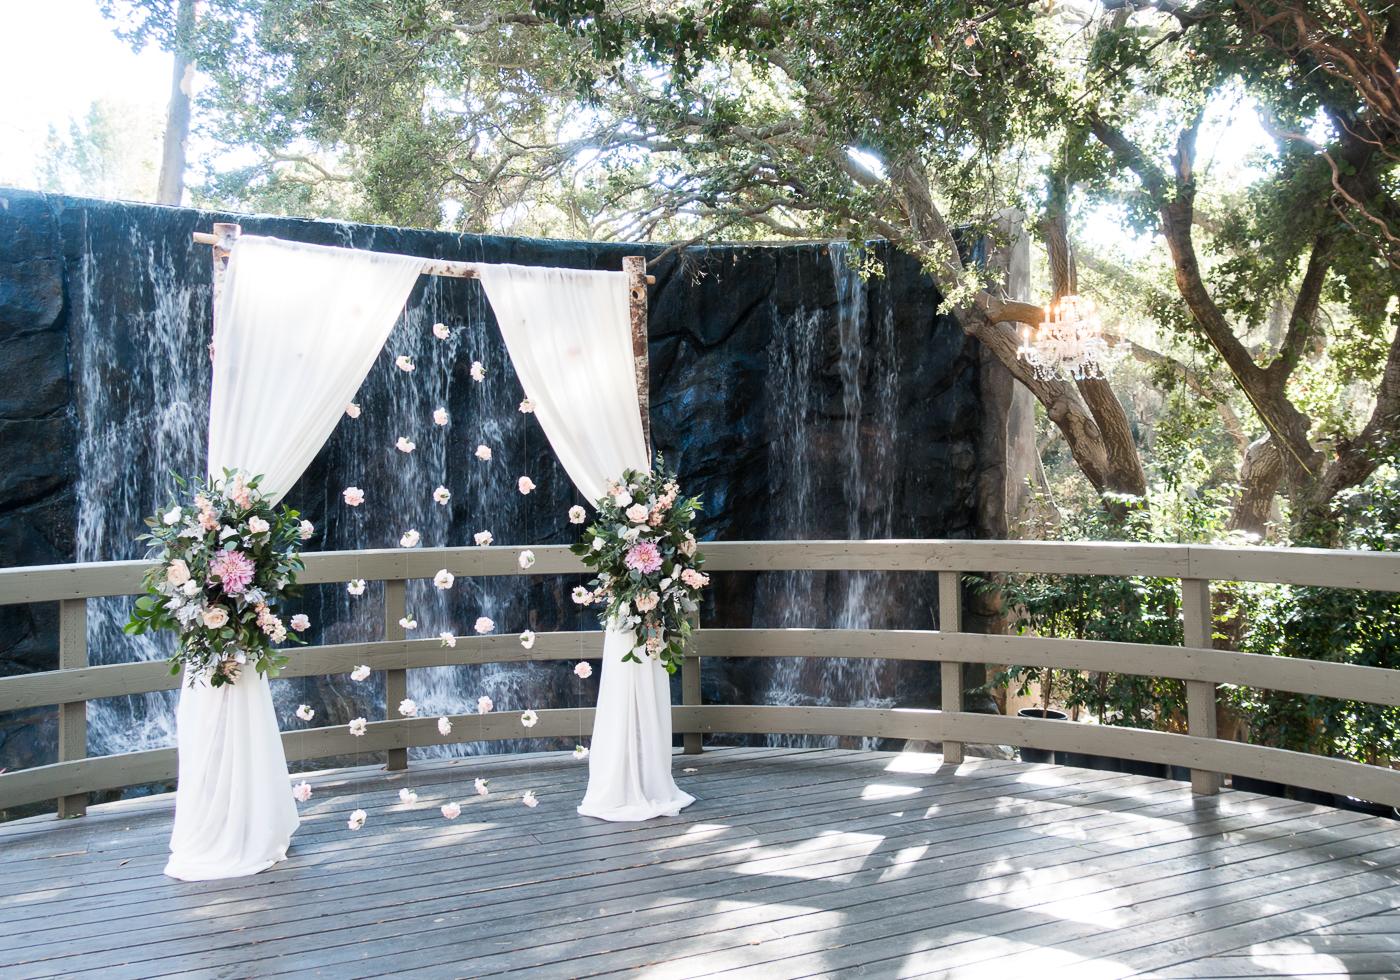 Calamigos Ranch - The Oak Room Wedding | The Chic Diary